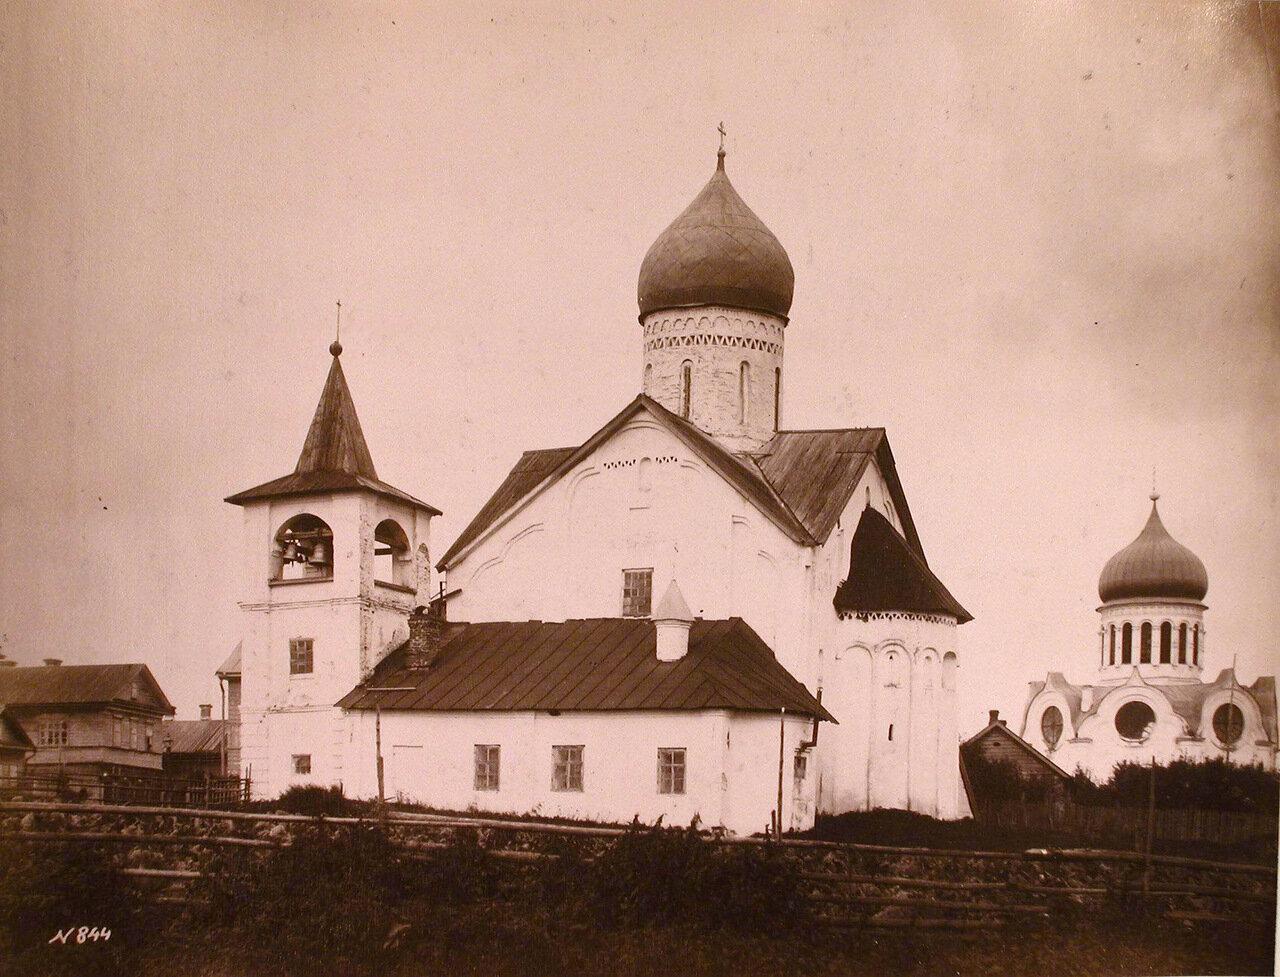 Вид южного фасада церкви Петра и Павла на Городу